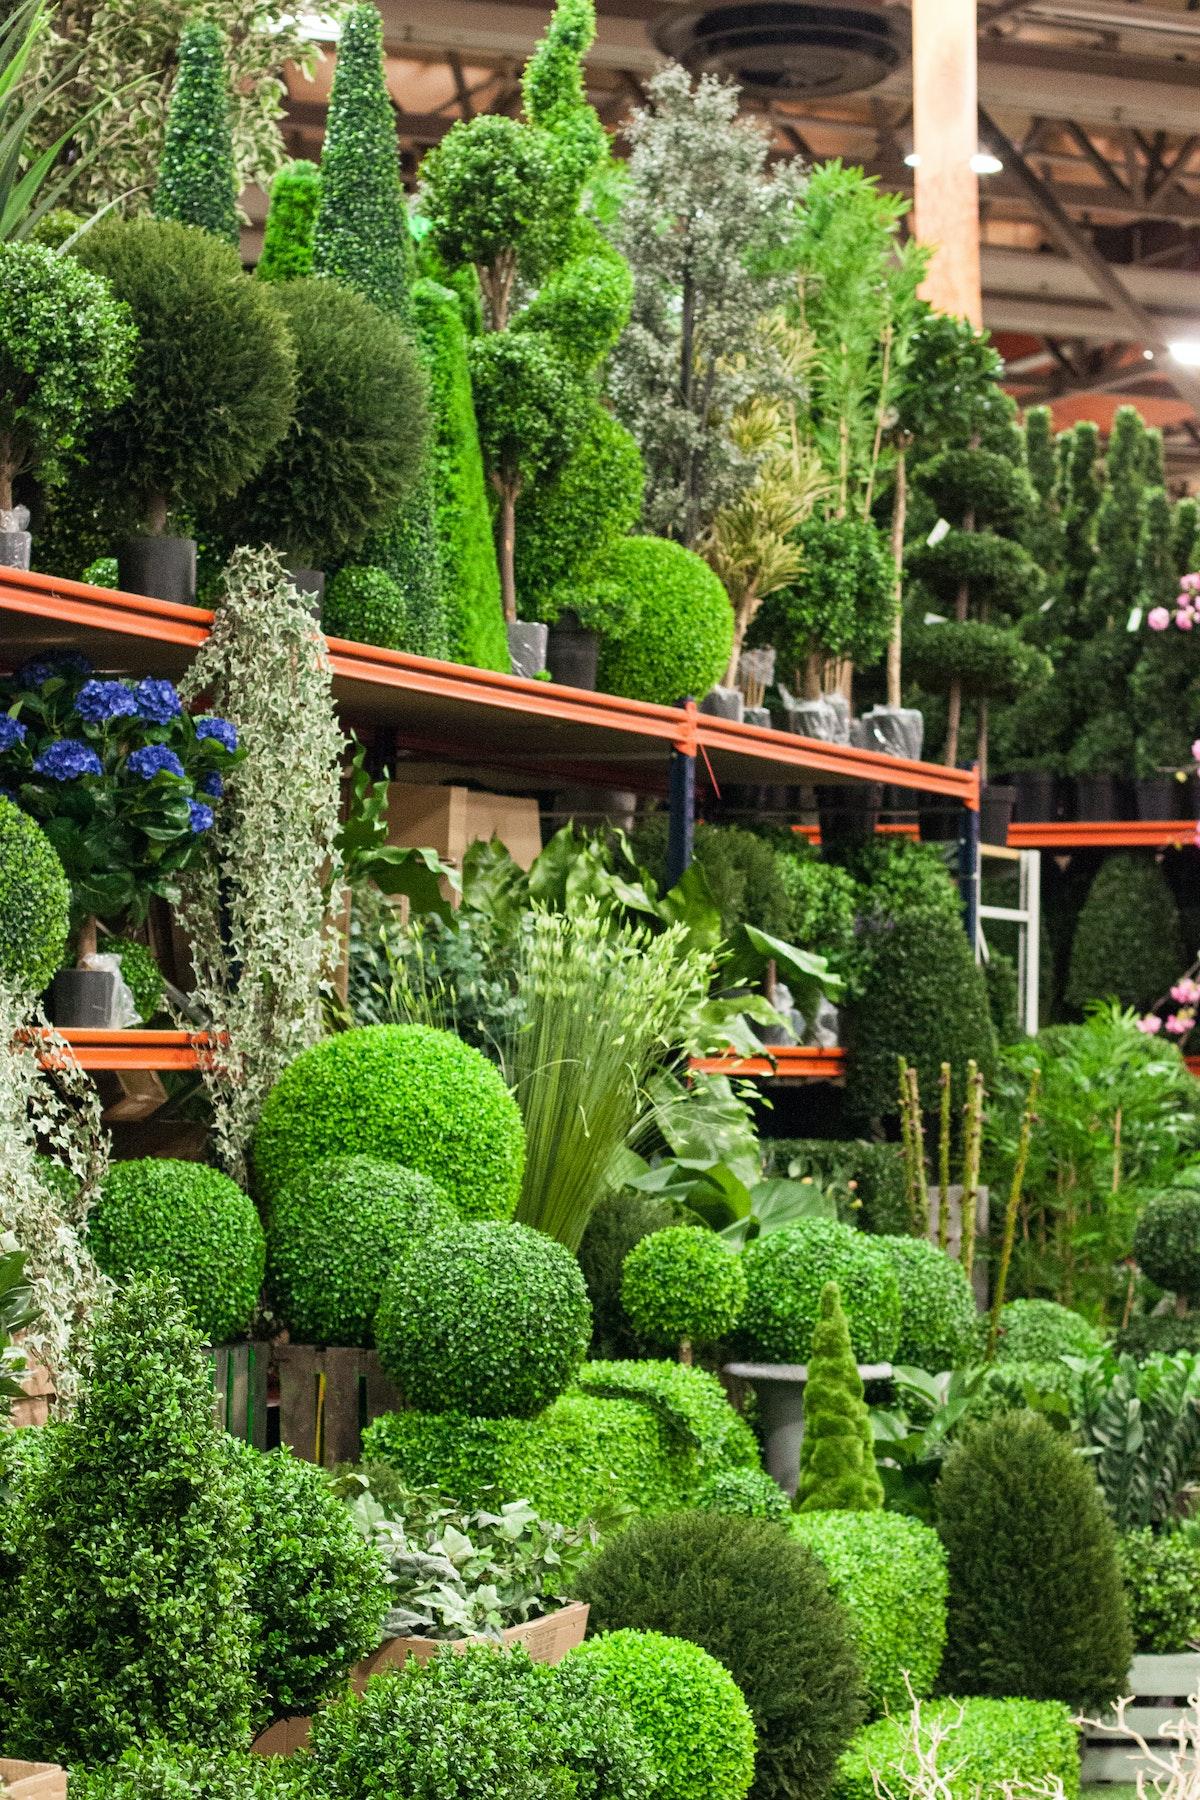 New Covent Garden Flower Market March 2015 Market Report Flowerona 34